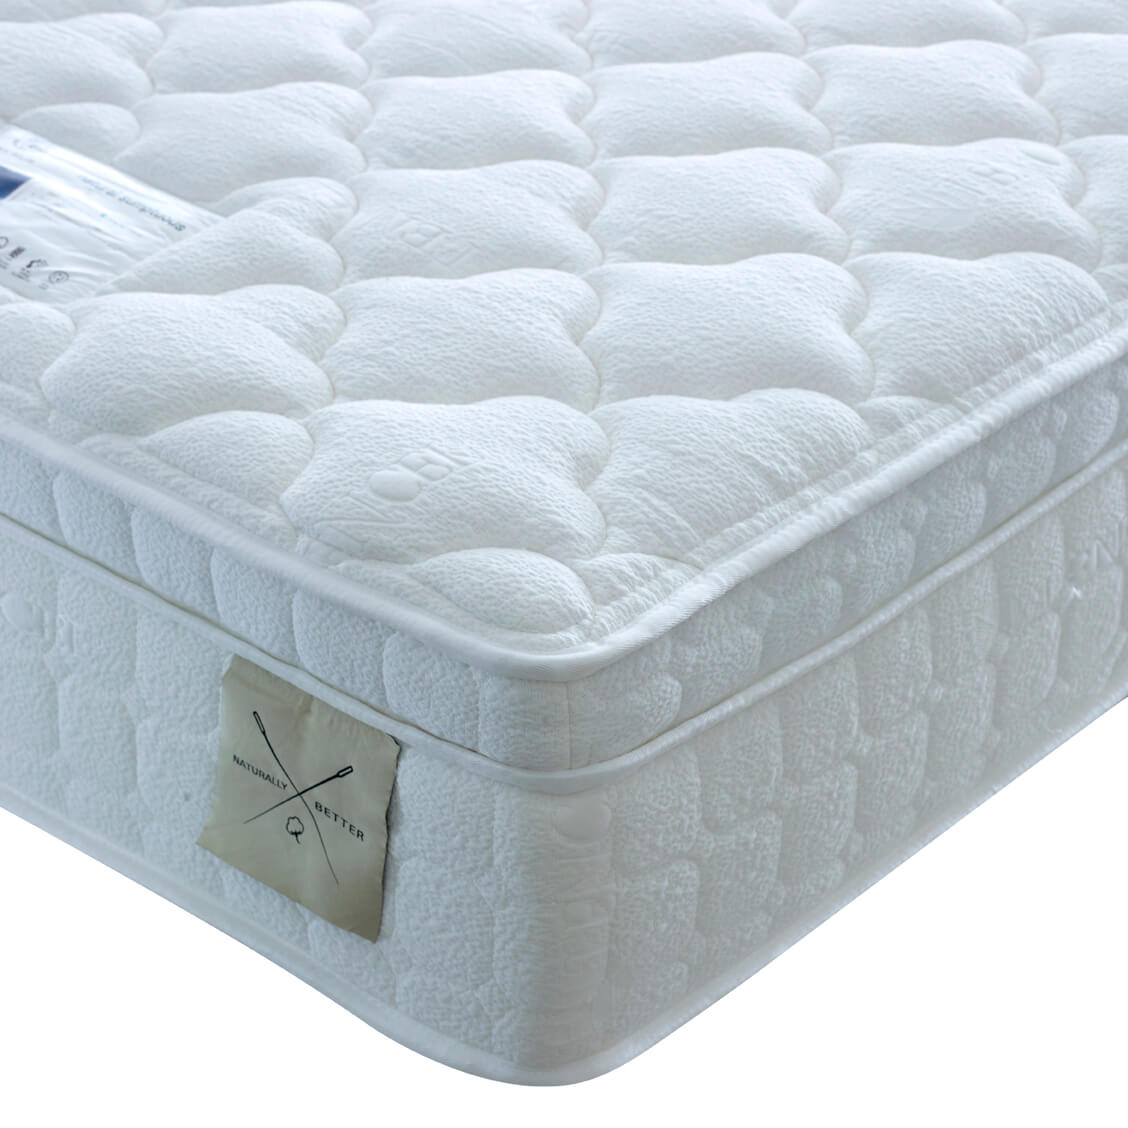 Natural Splendid 1500 - next day delivery mattress